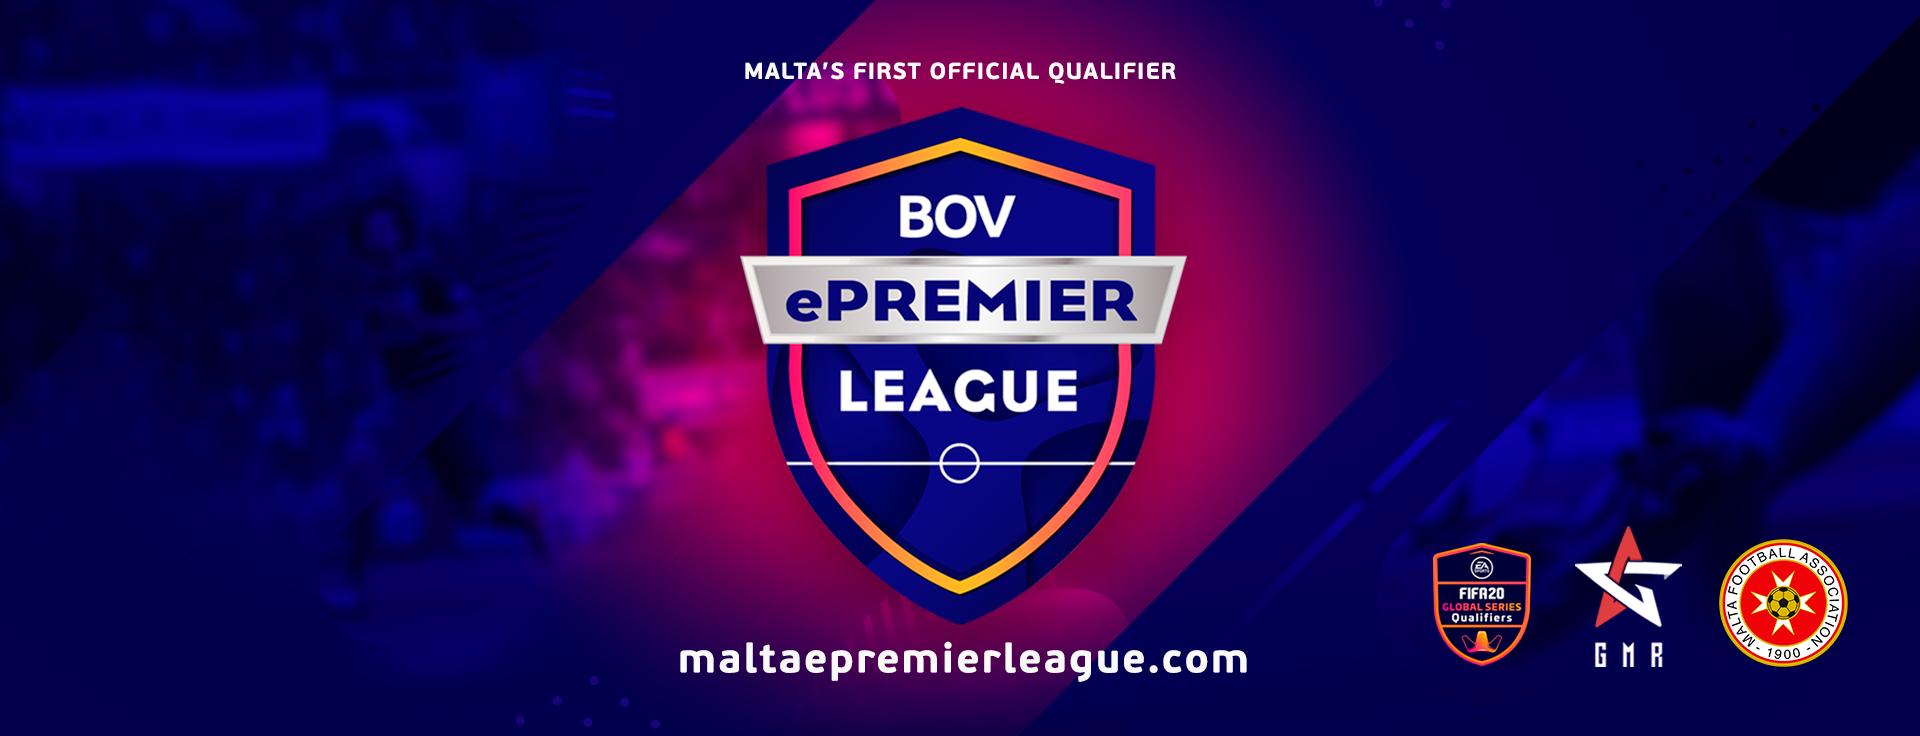 Malta BOV ePremier League Suspended